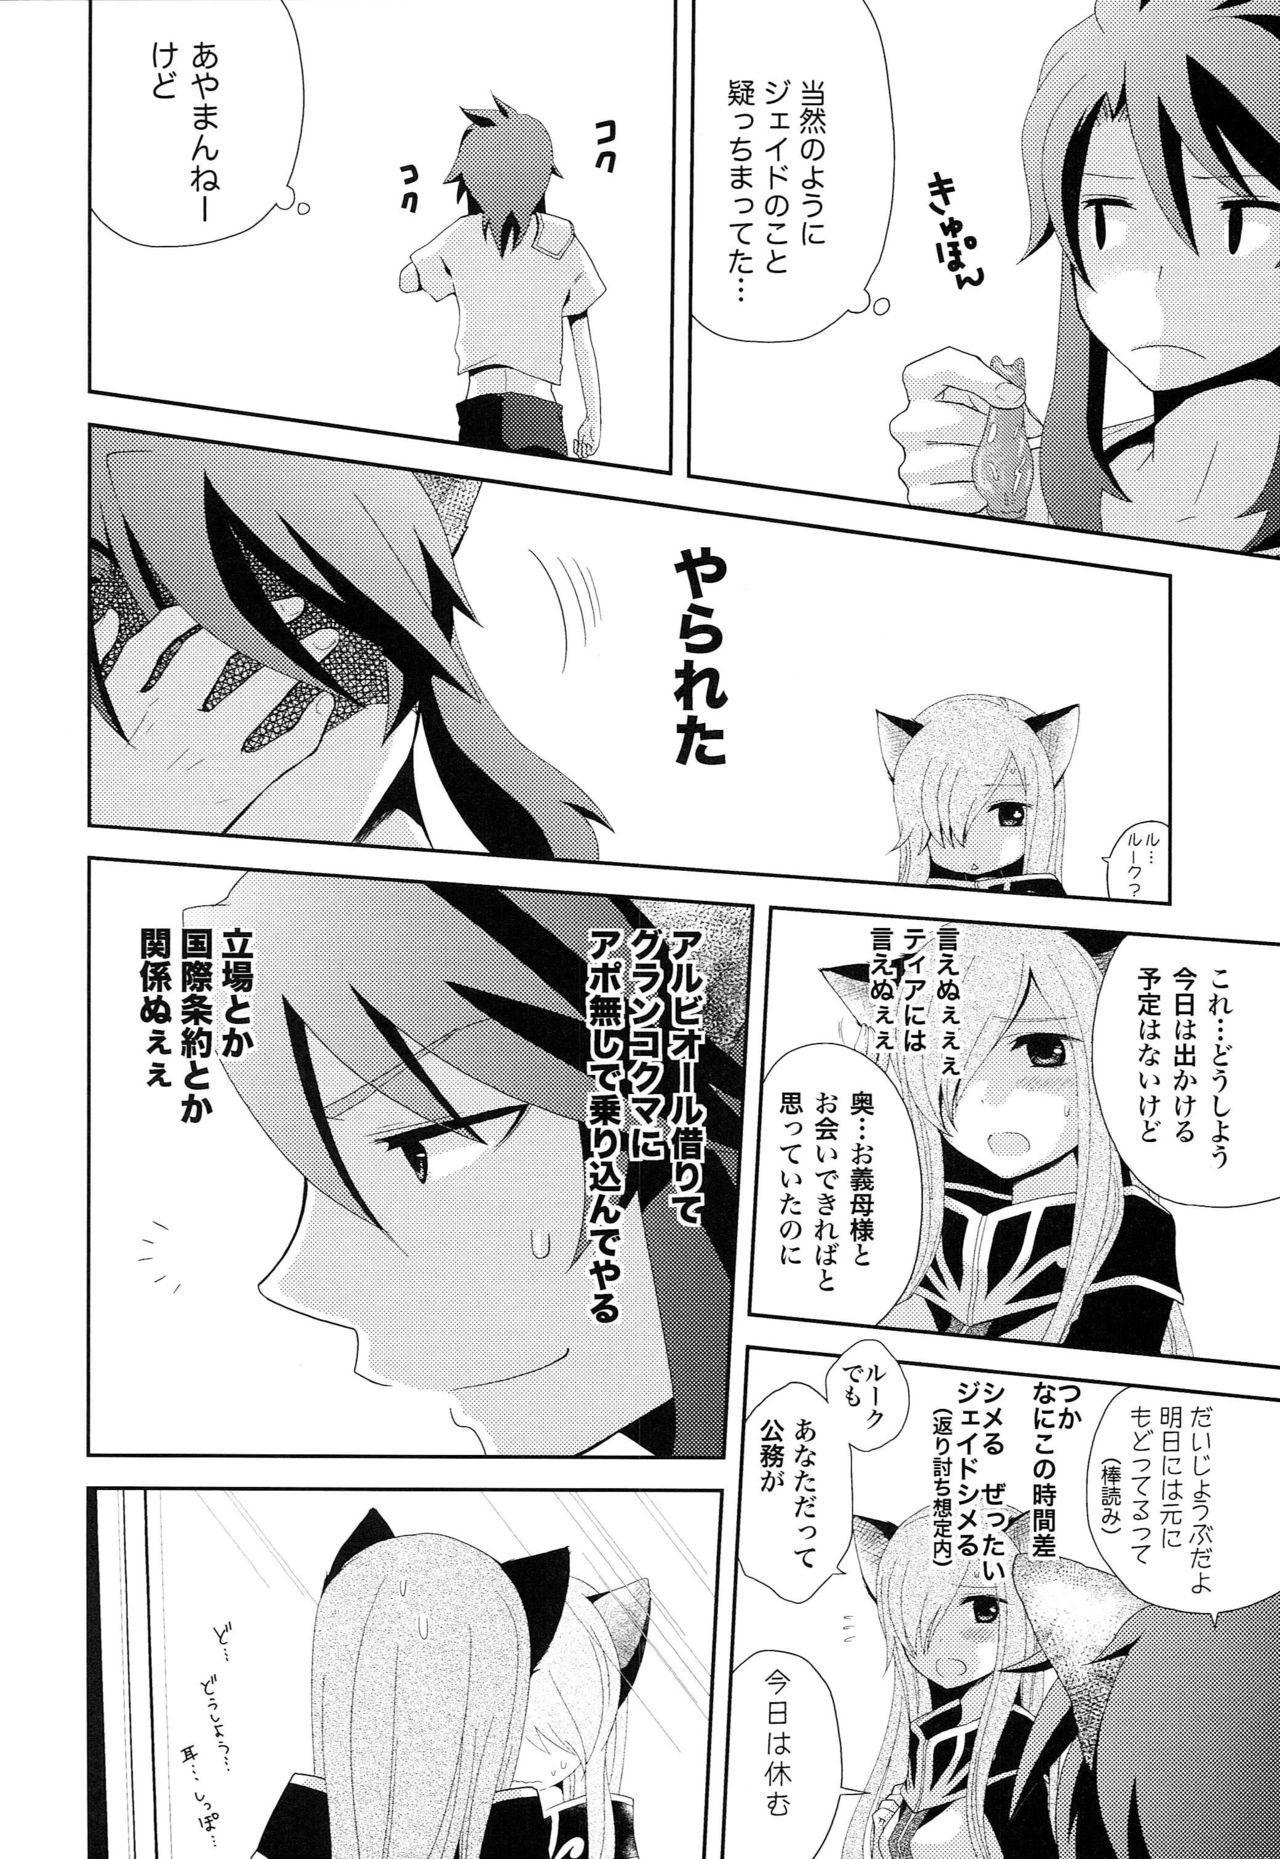 Meshimase Miso Panna 12